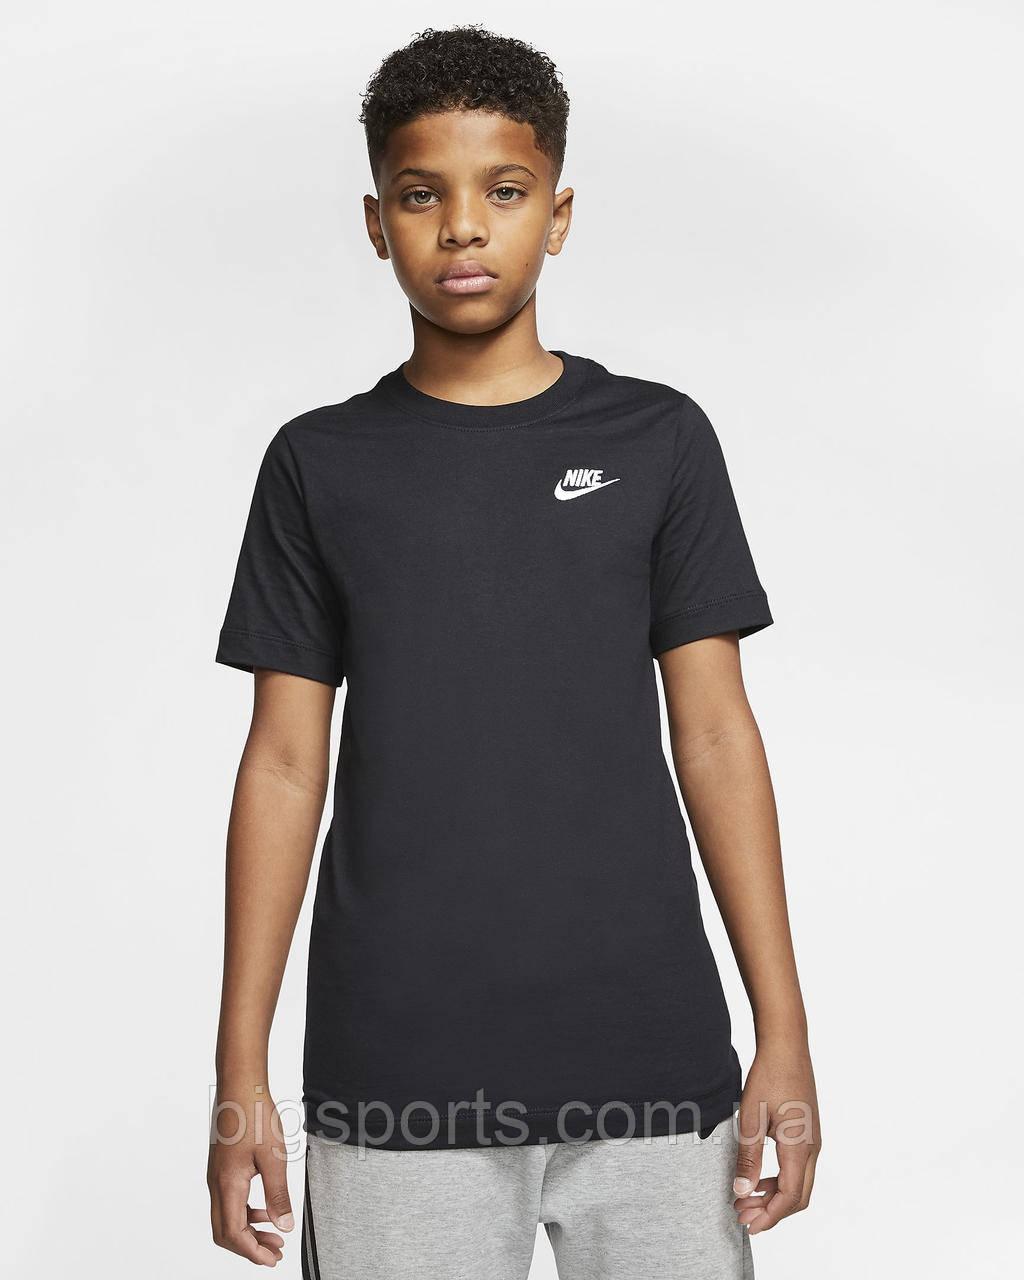 Футболка дет. Nike B Nsw Tee Emb Futura (арт. AR5254-010)